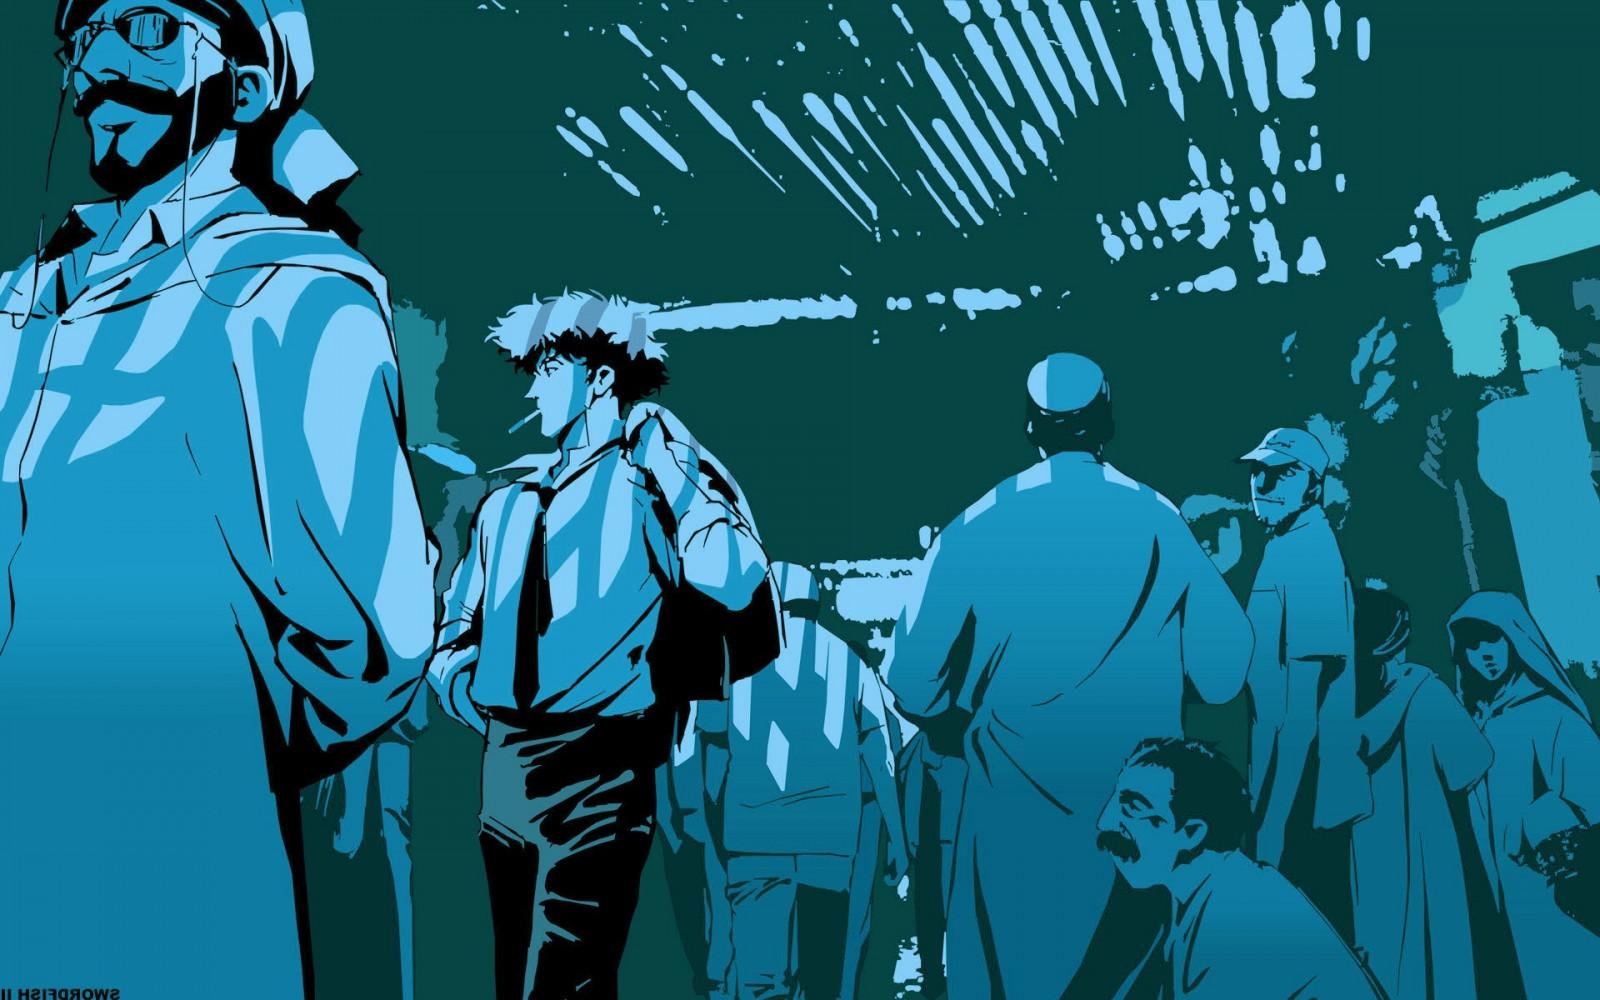 Great Wallpaper Movie Cowboy Bebop - 1920x1200_px_anime_Cowboy_Bebop_movies-627411  Collection_587574.jpg!d